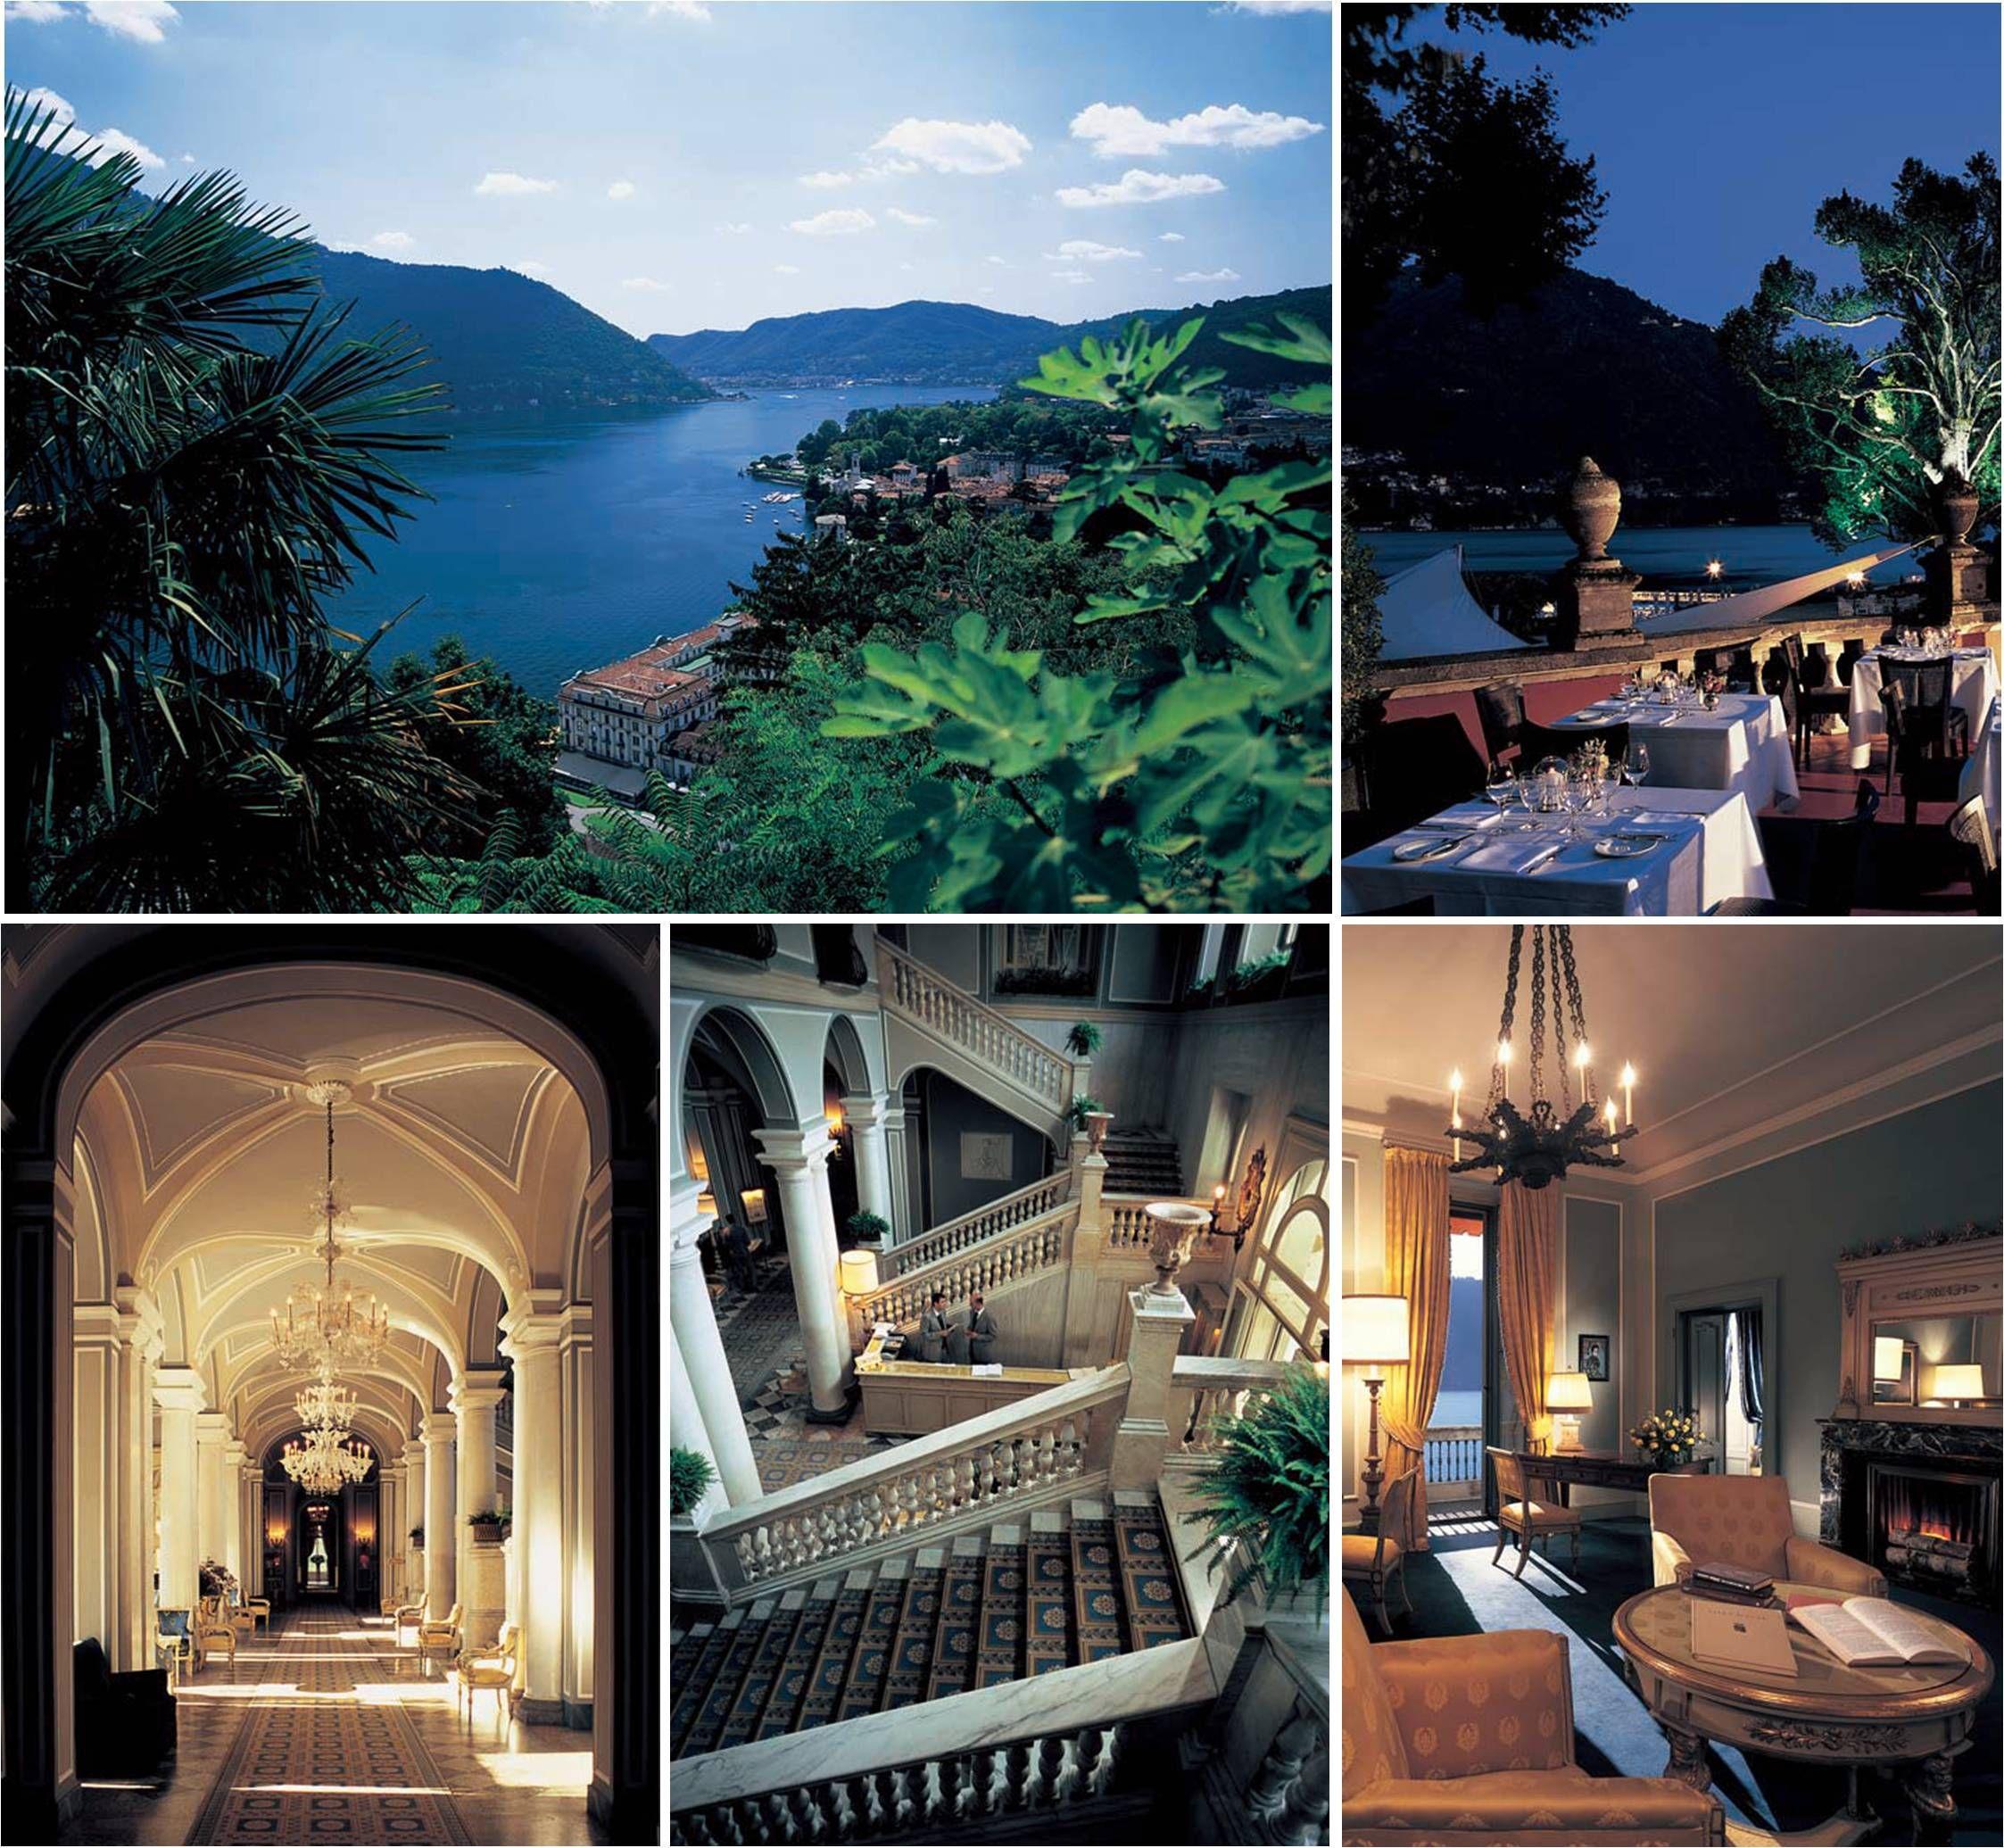 Villa D'Este In Italy, Overlooking Como Lake